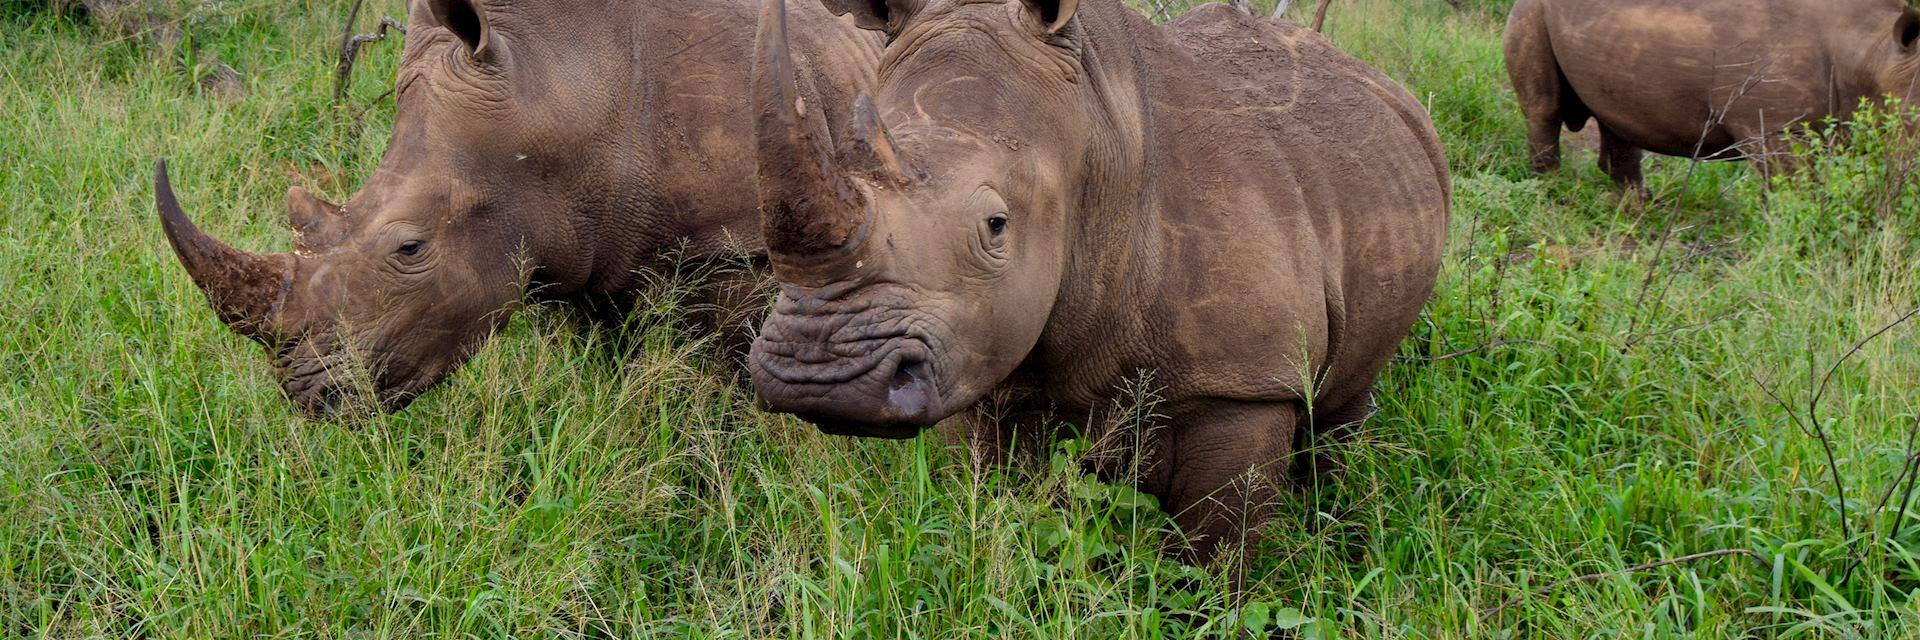 White rhino at Thanda Safari Private Game Reserve